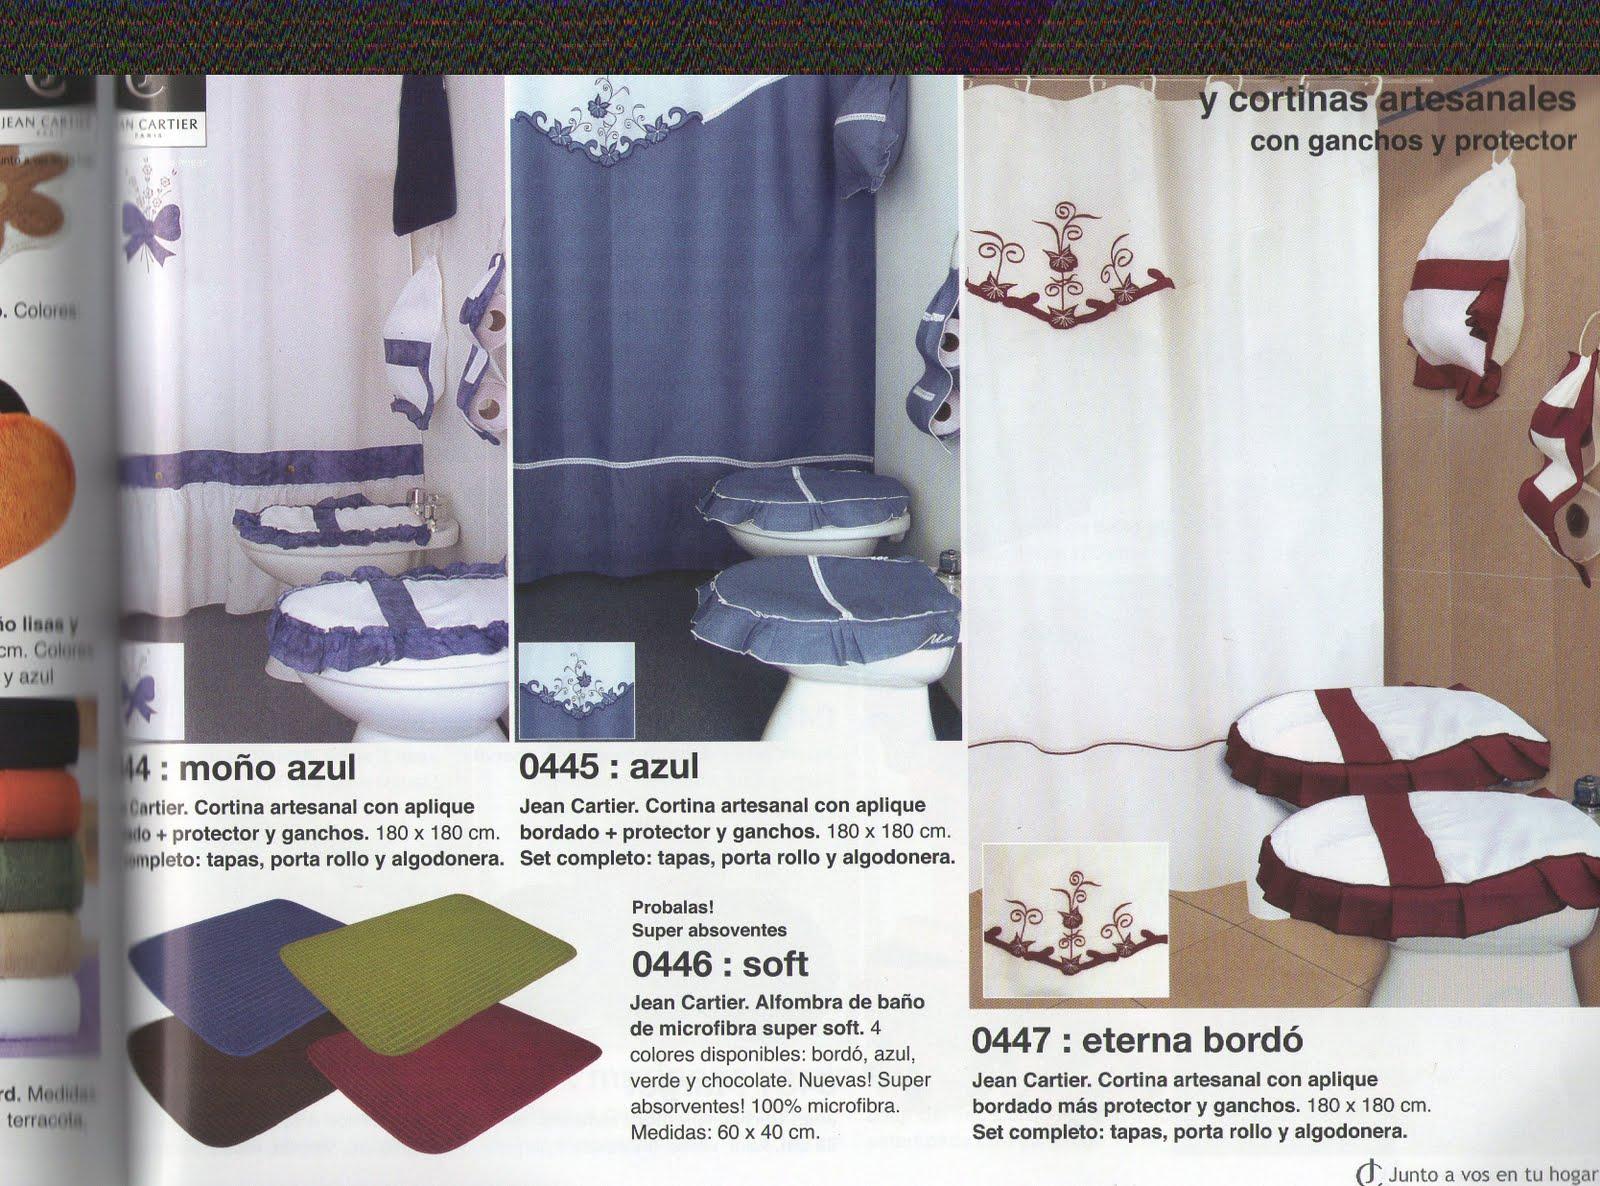 Jean cartier temporada oto o invierno 2011 cortinas de for Ganchos para cortinas de bano de resina